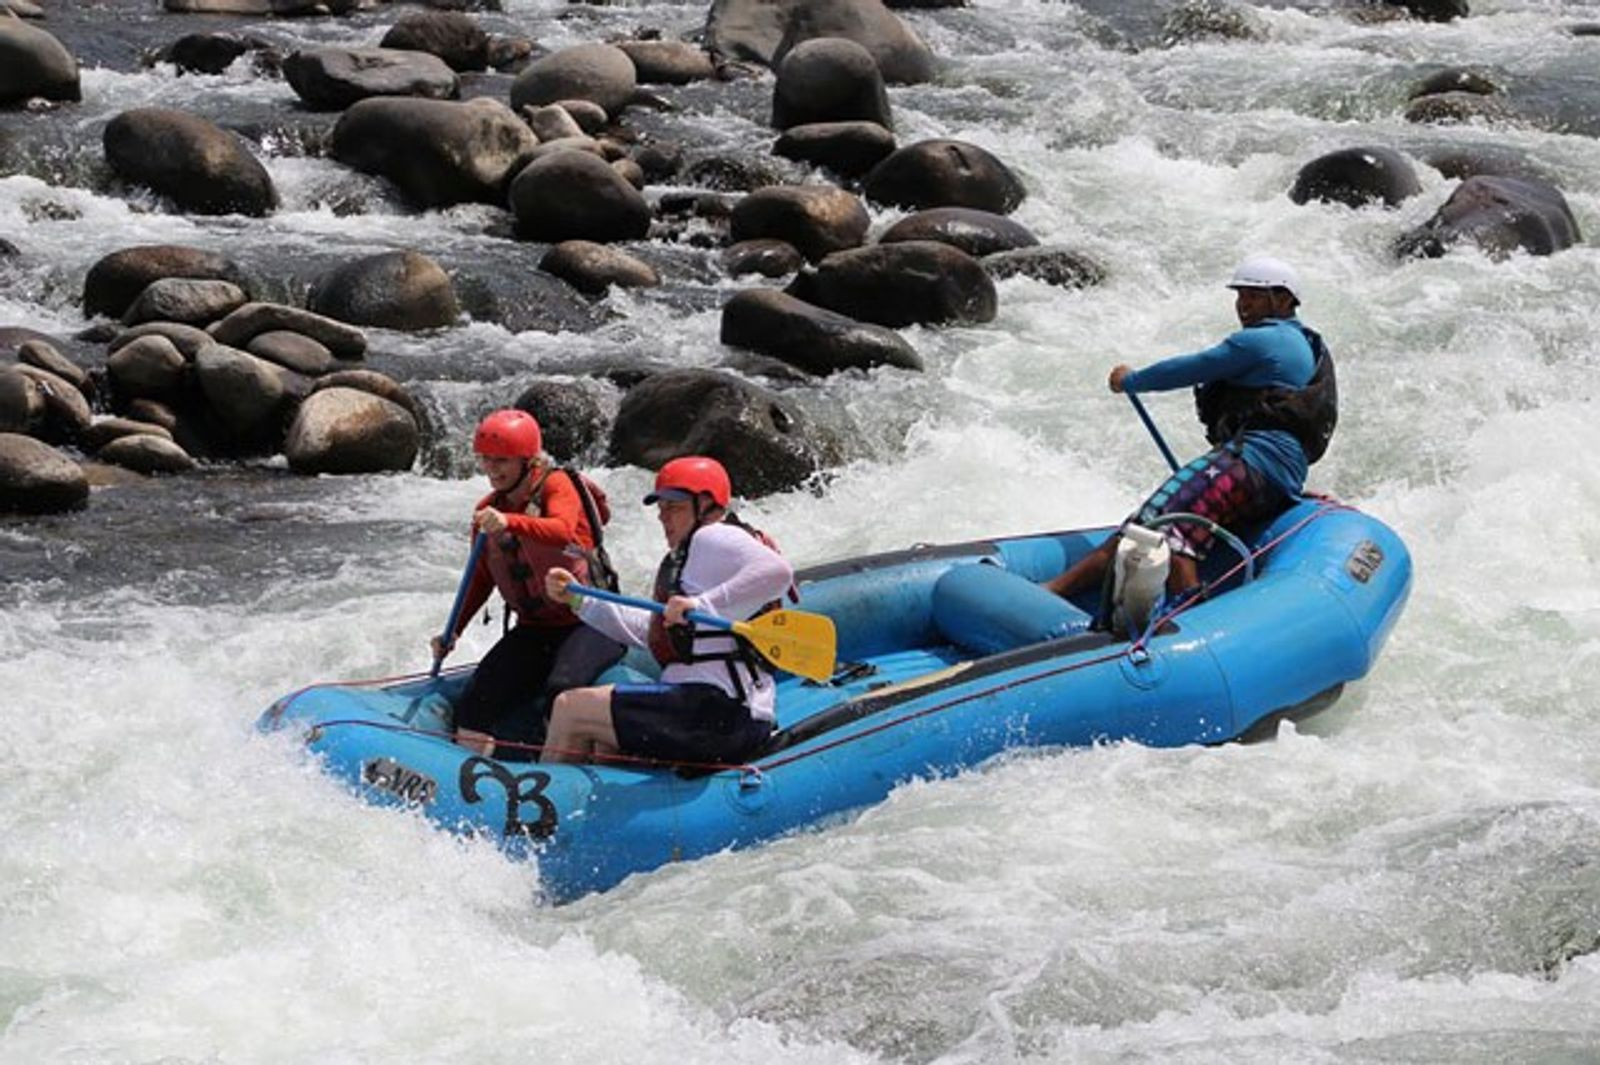 Costa Rica: Riding the rapids